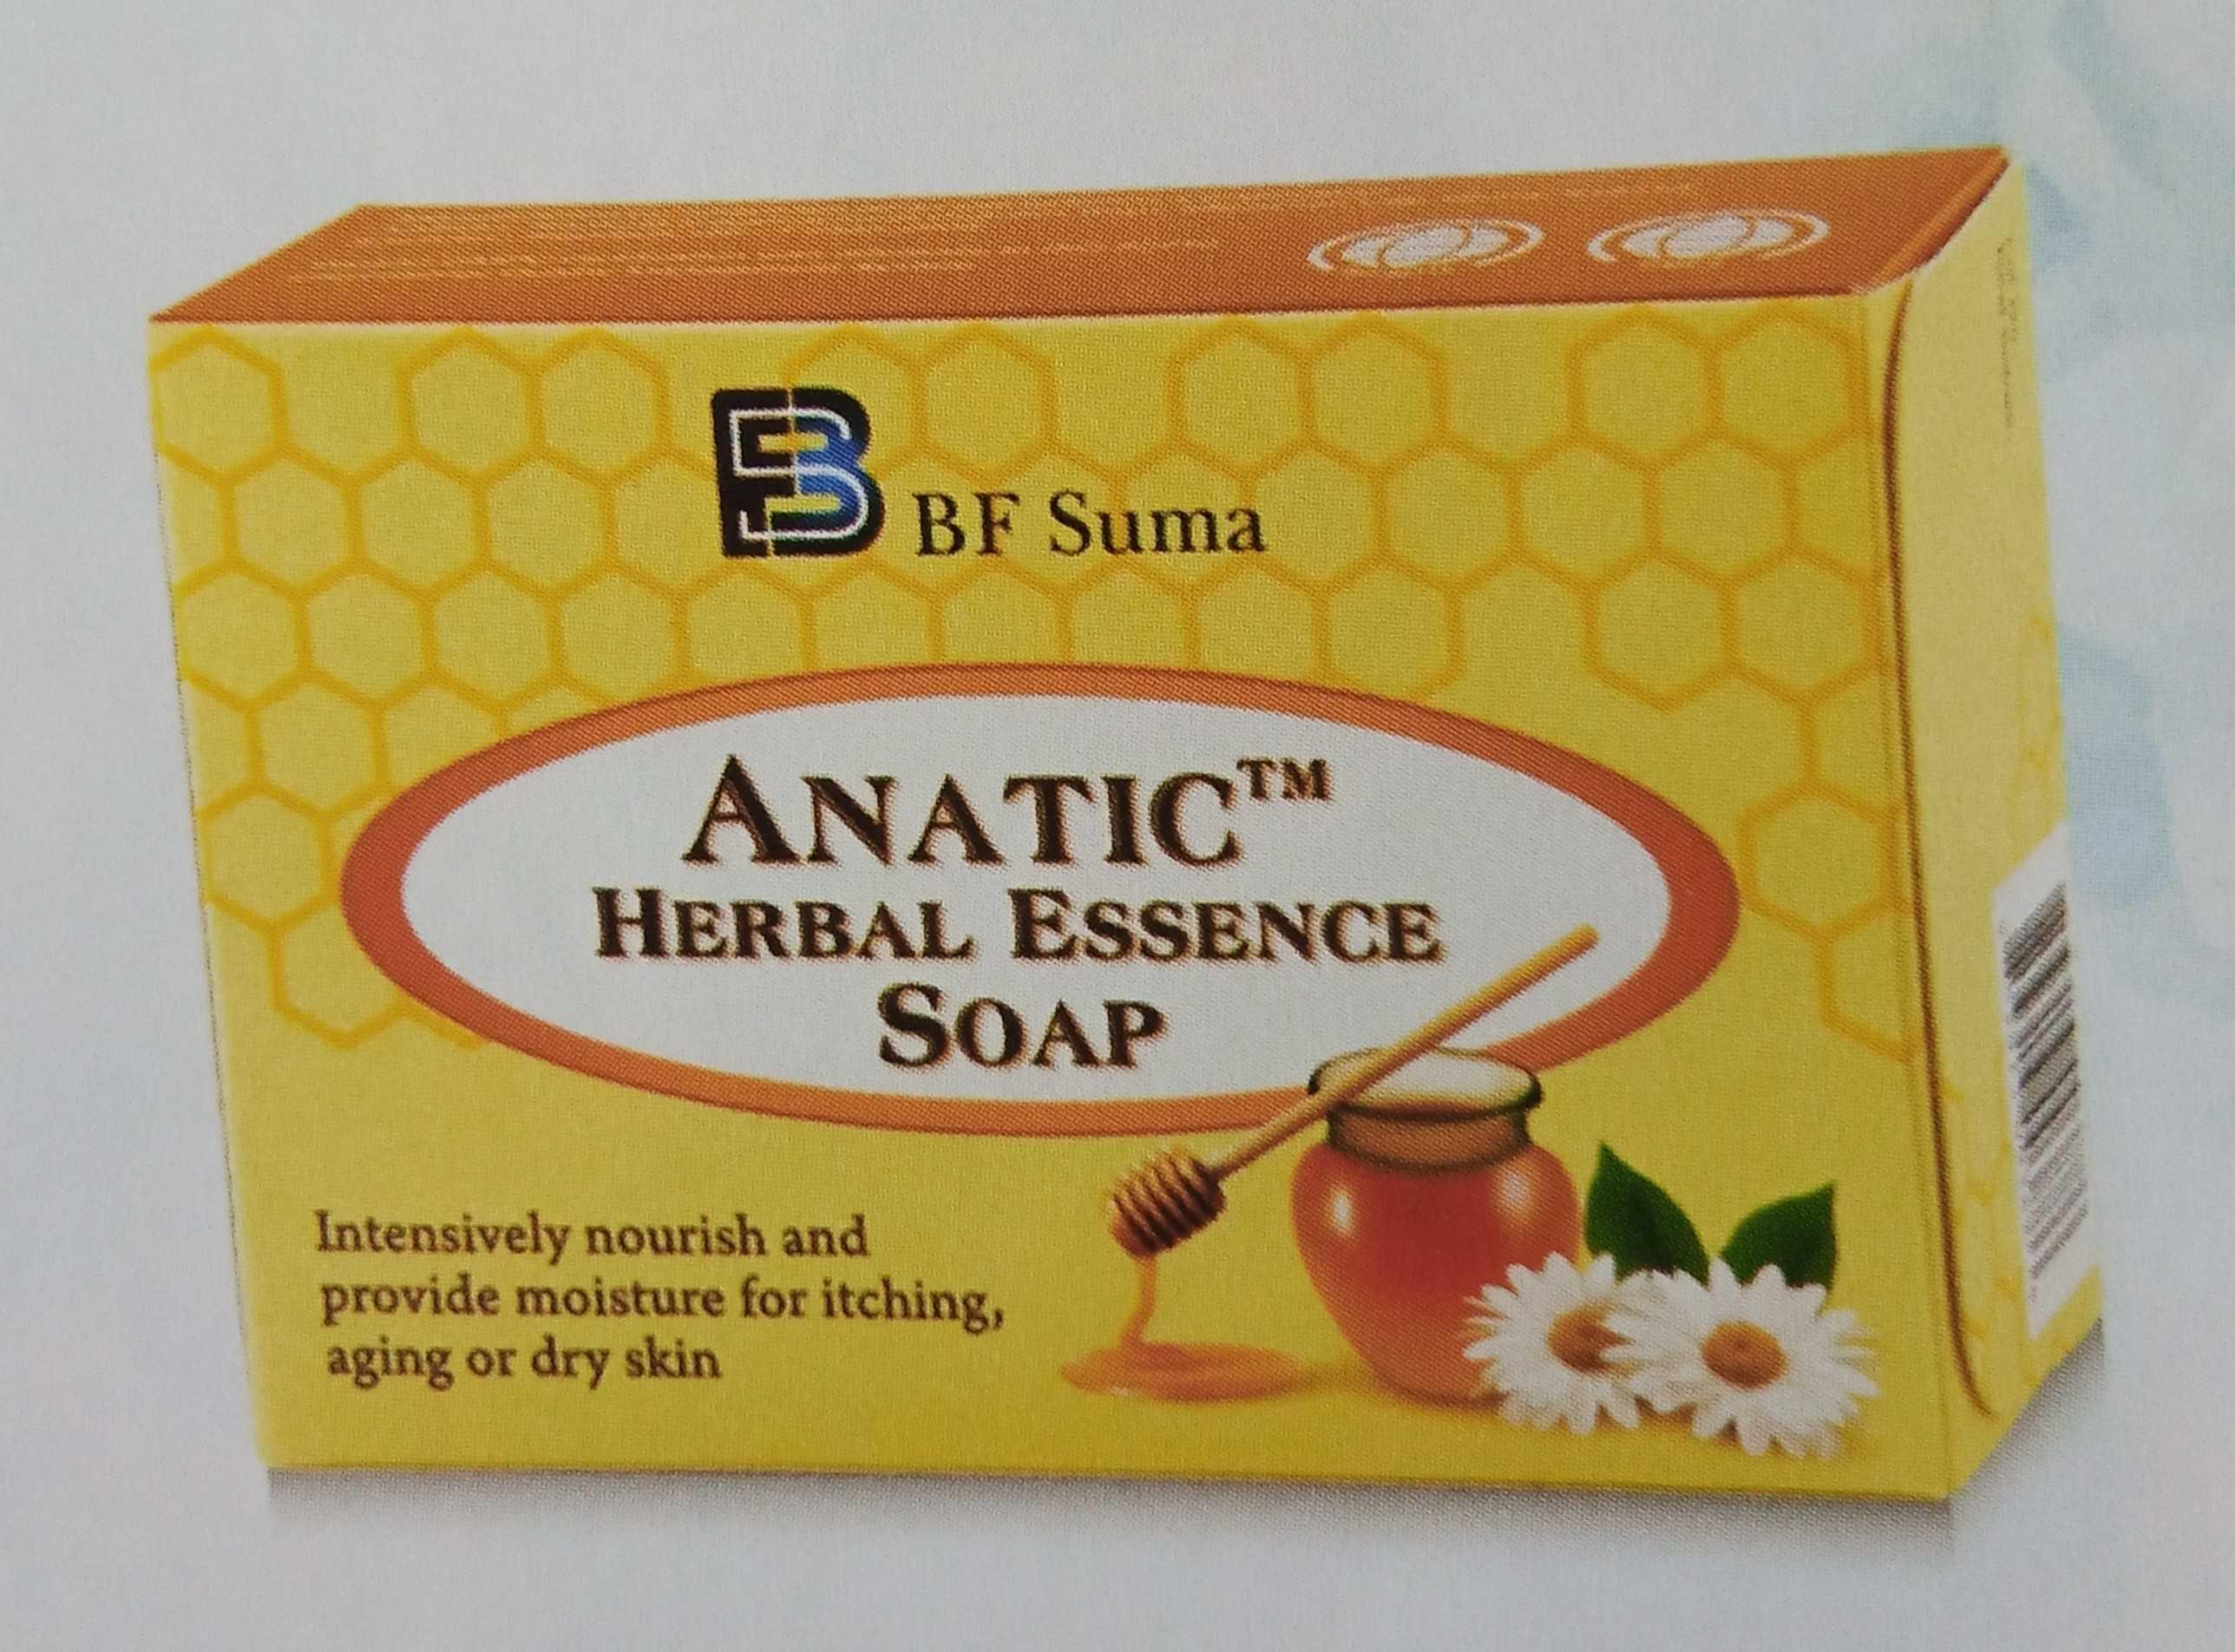 BFSUMA Anatic Herbal Essence Soap ( 6 PACK)